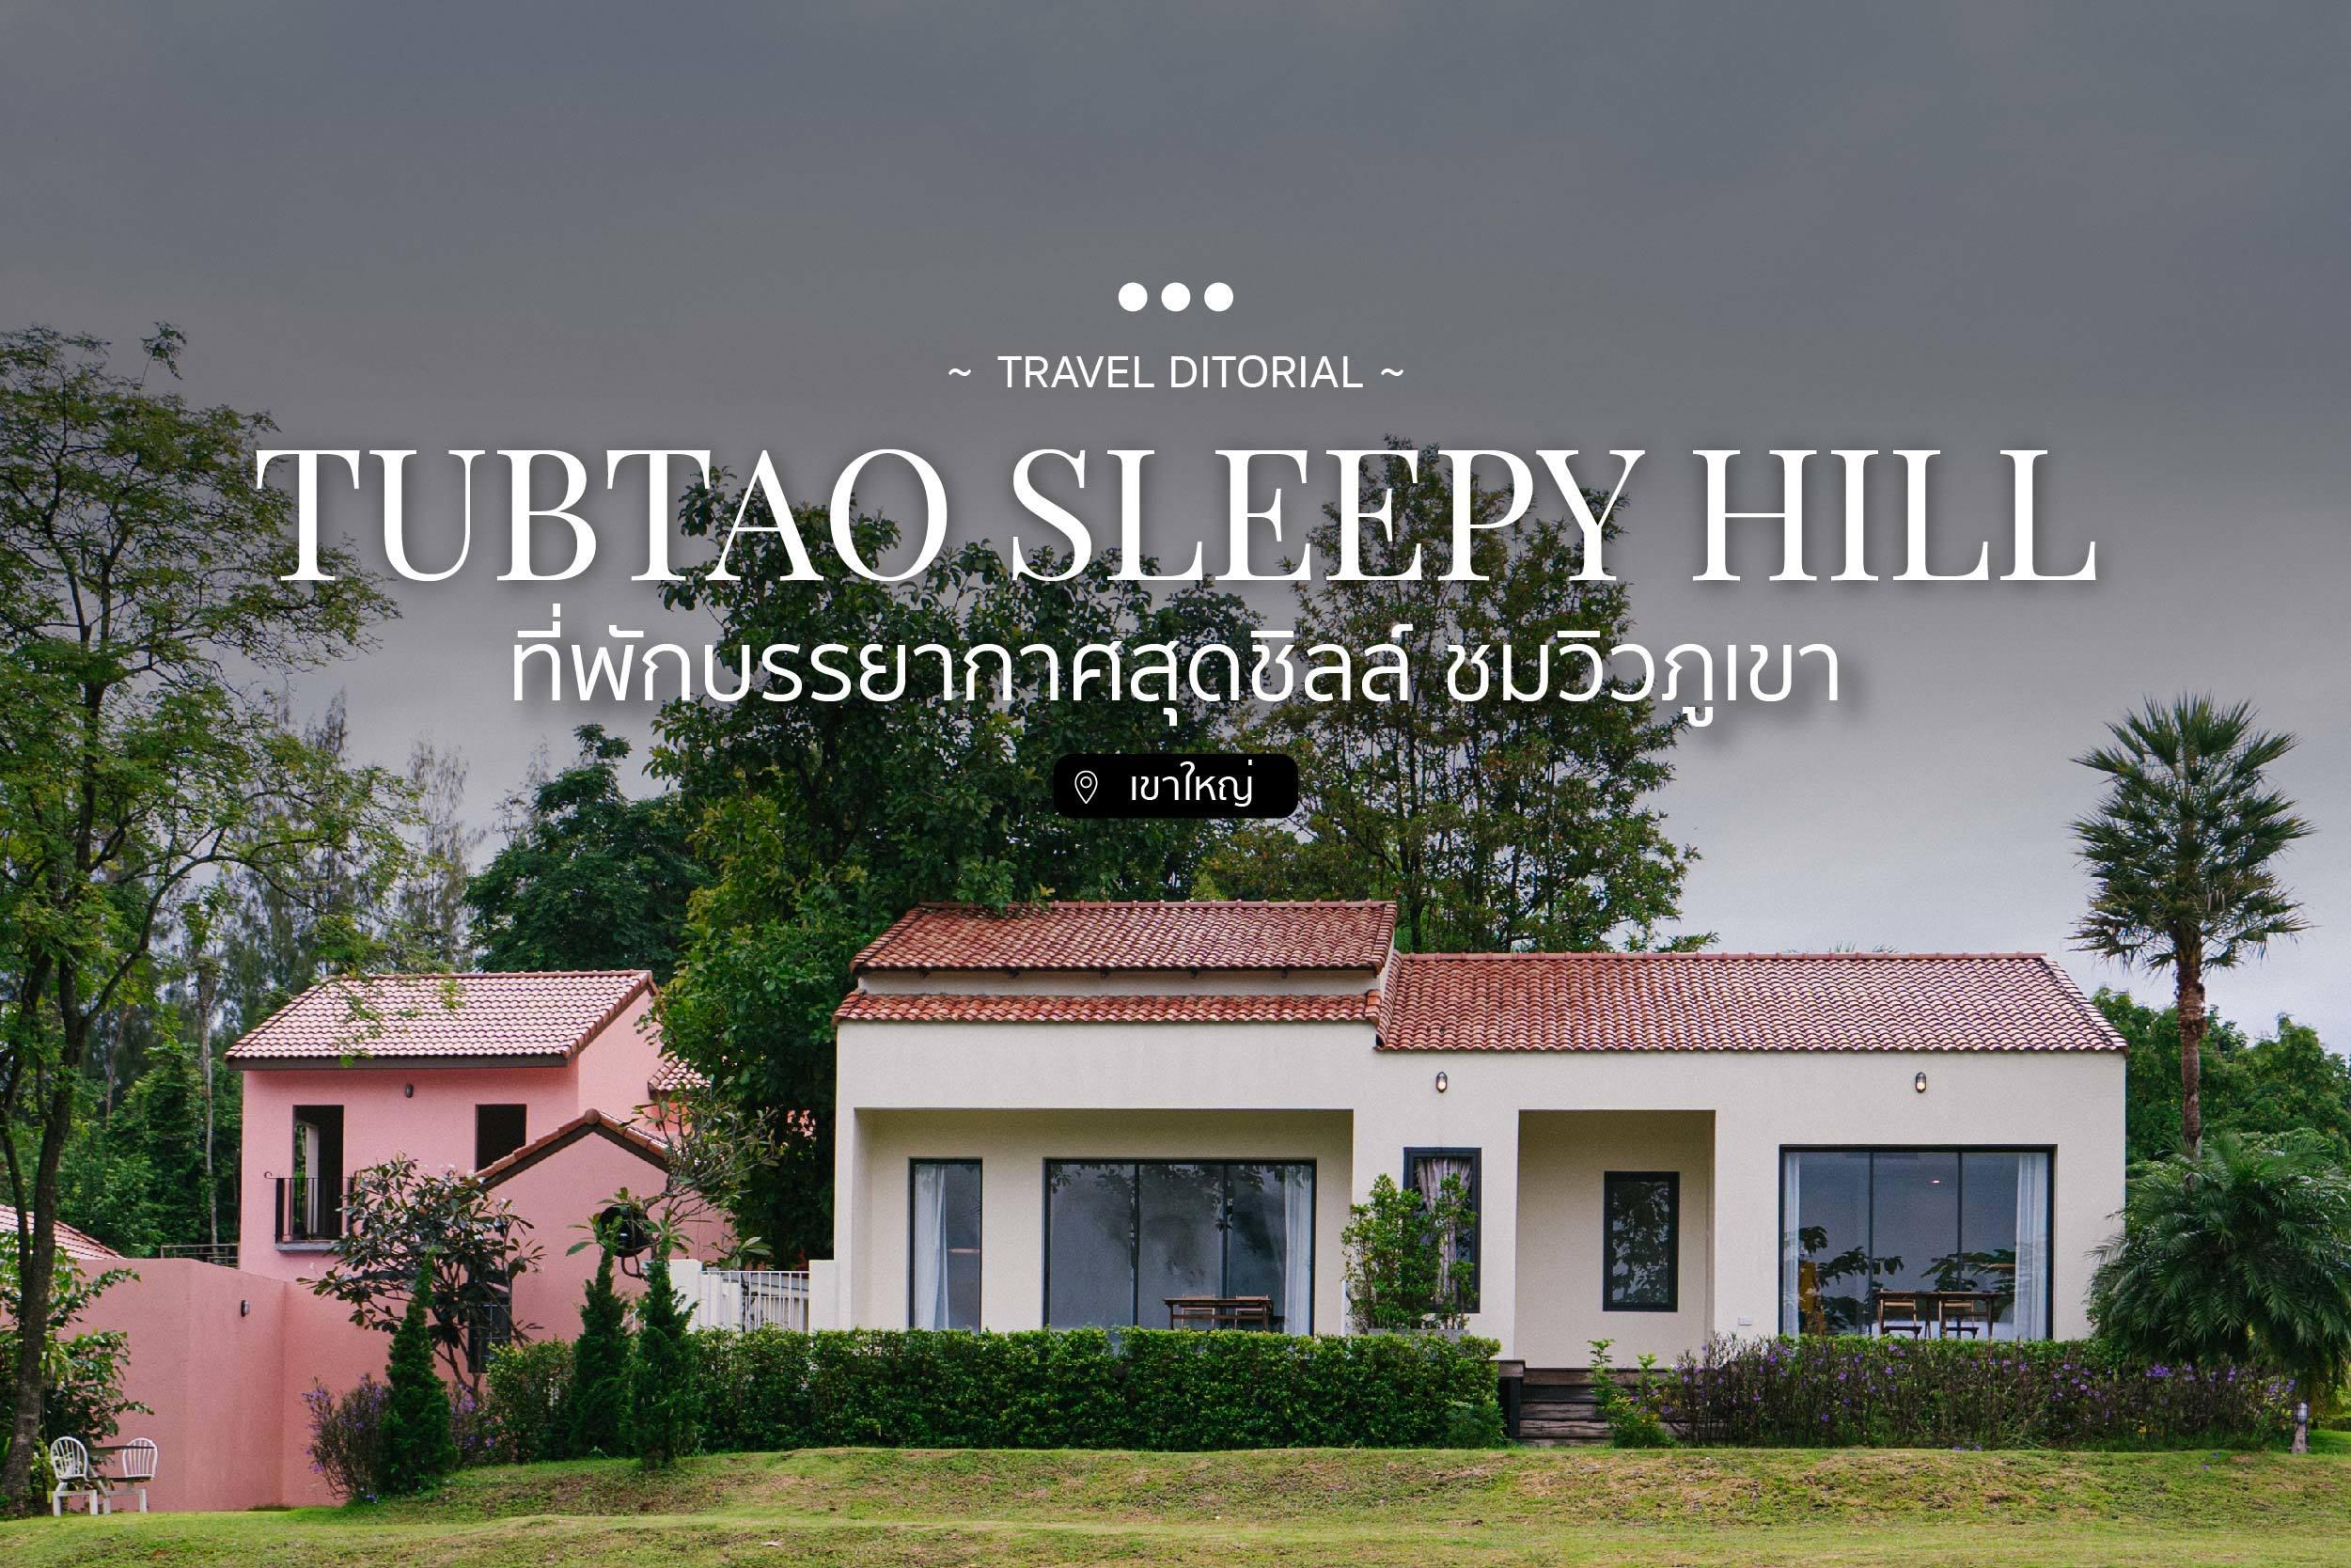 Tubtao Sleepy hill ปกweb 48